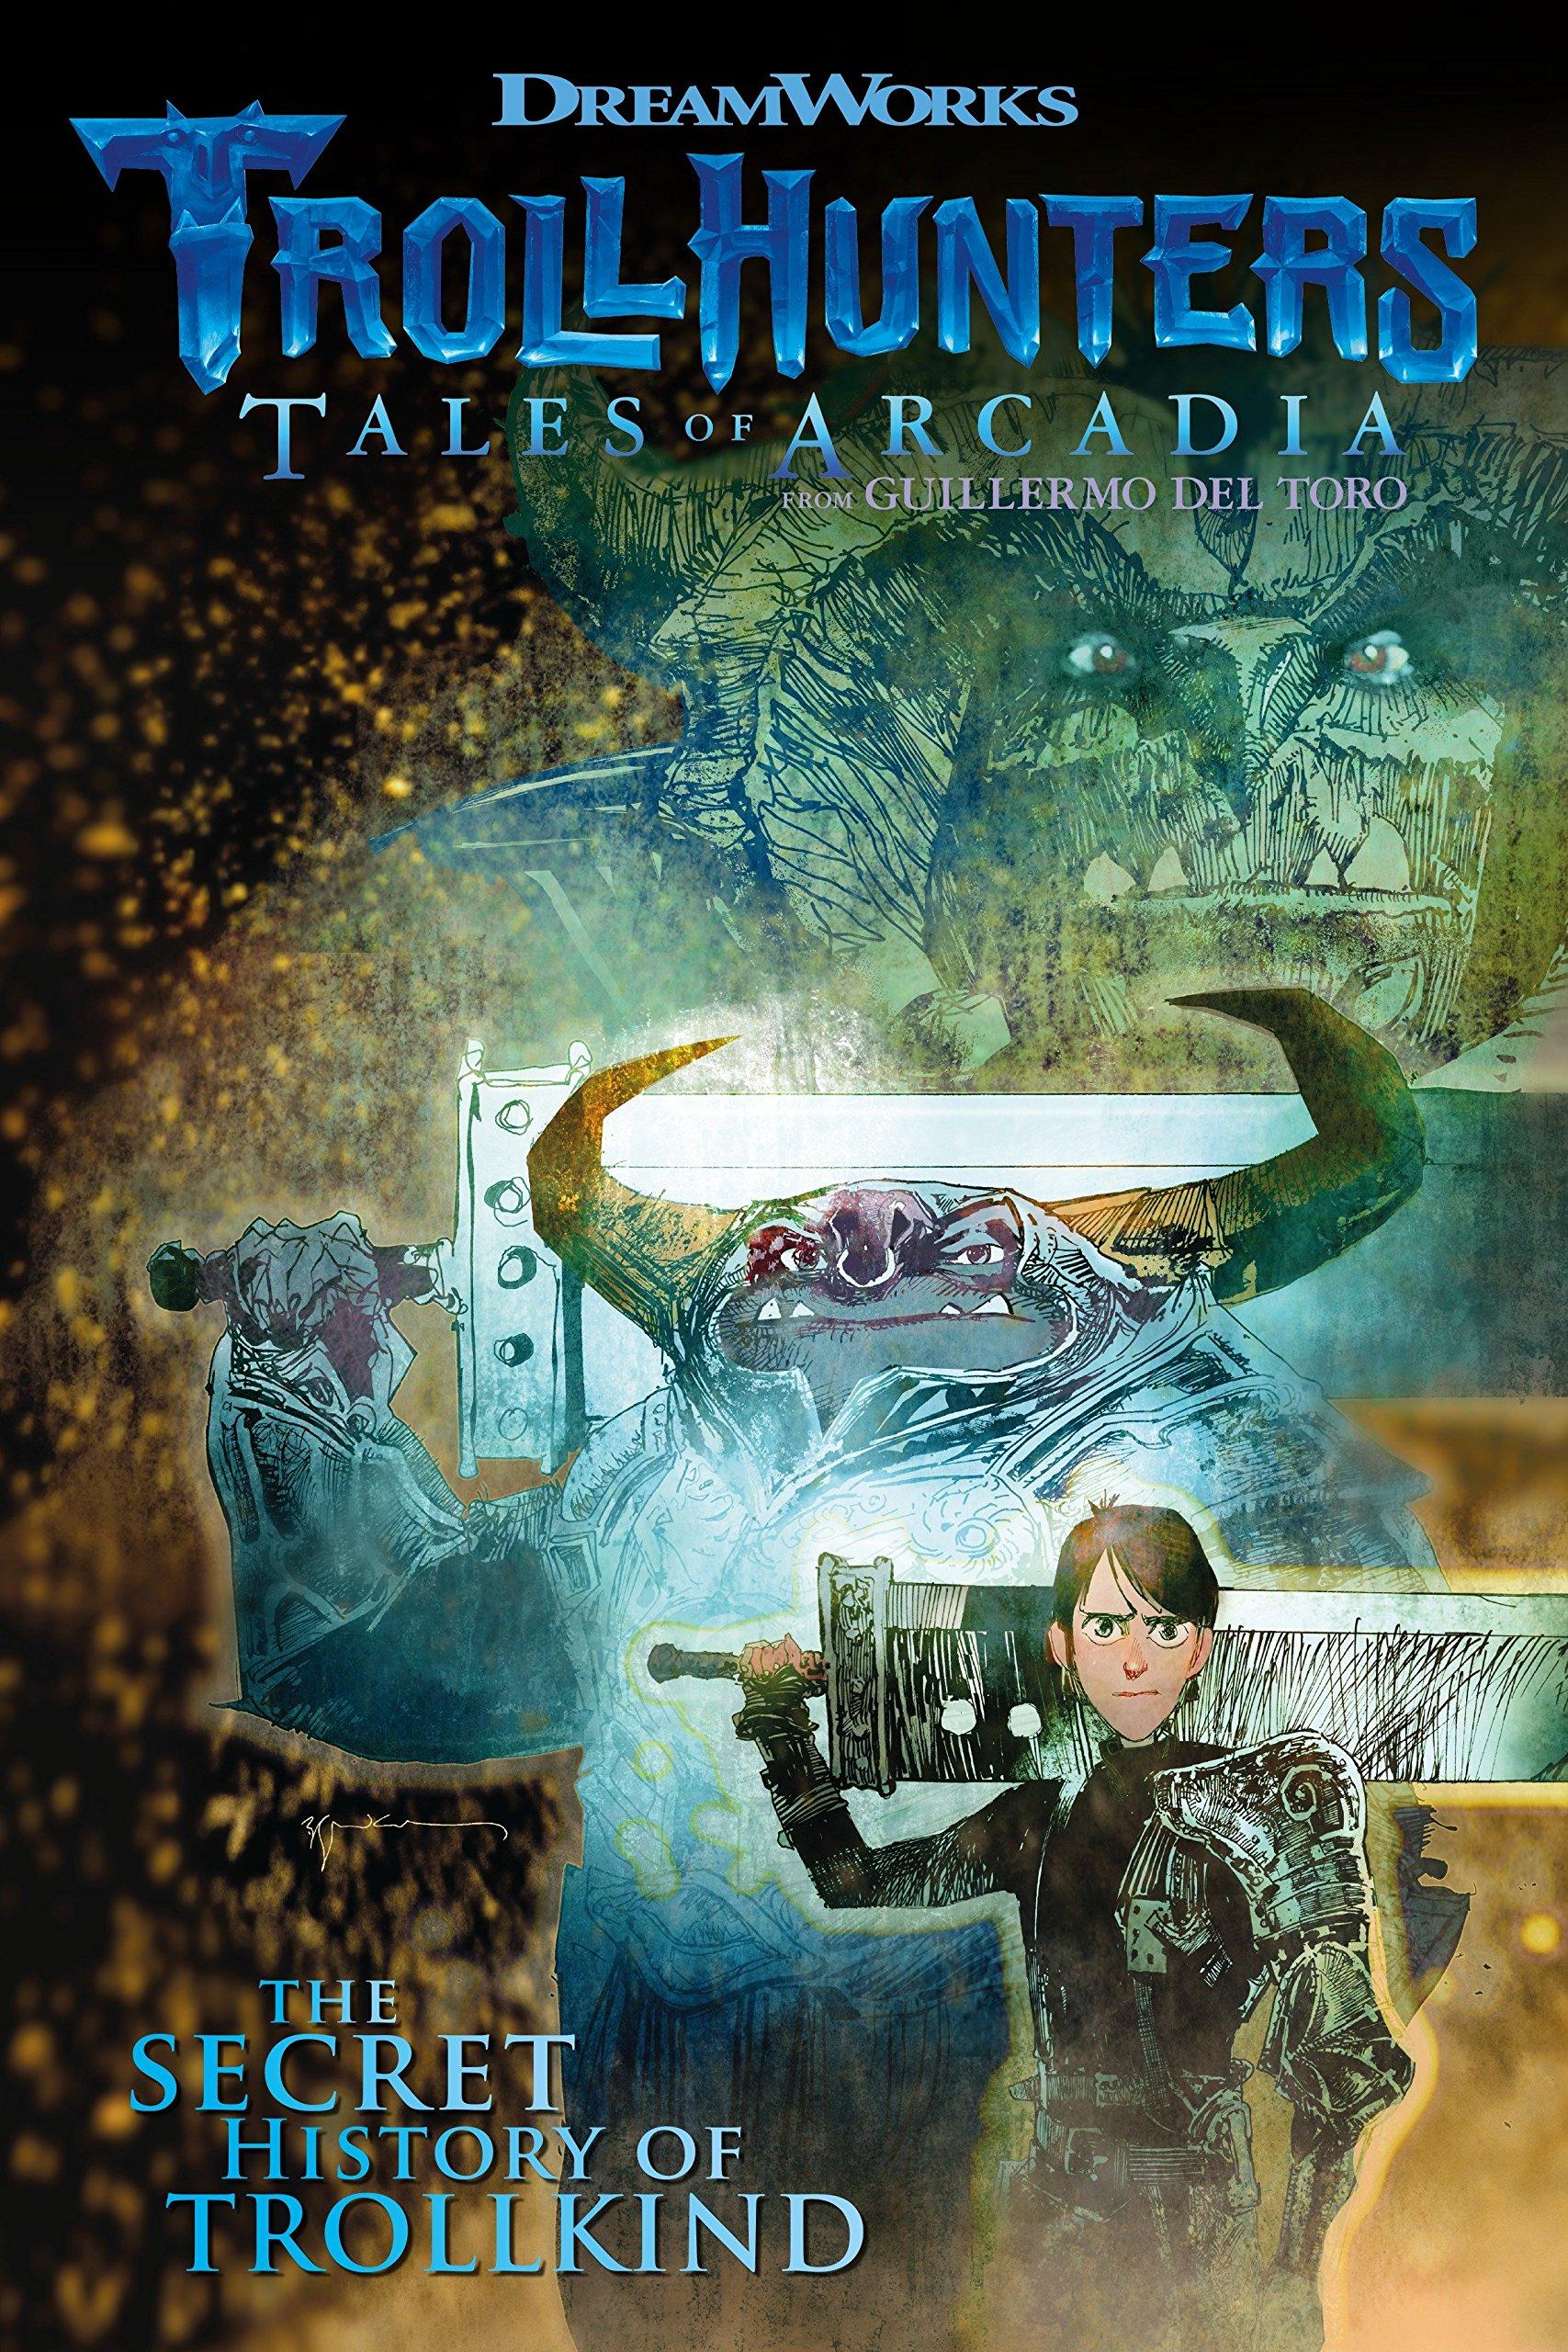 Trollhunters: Tales of Arcadia The Secret History of Trollkind